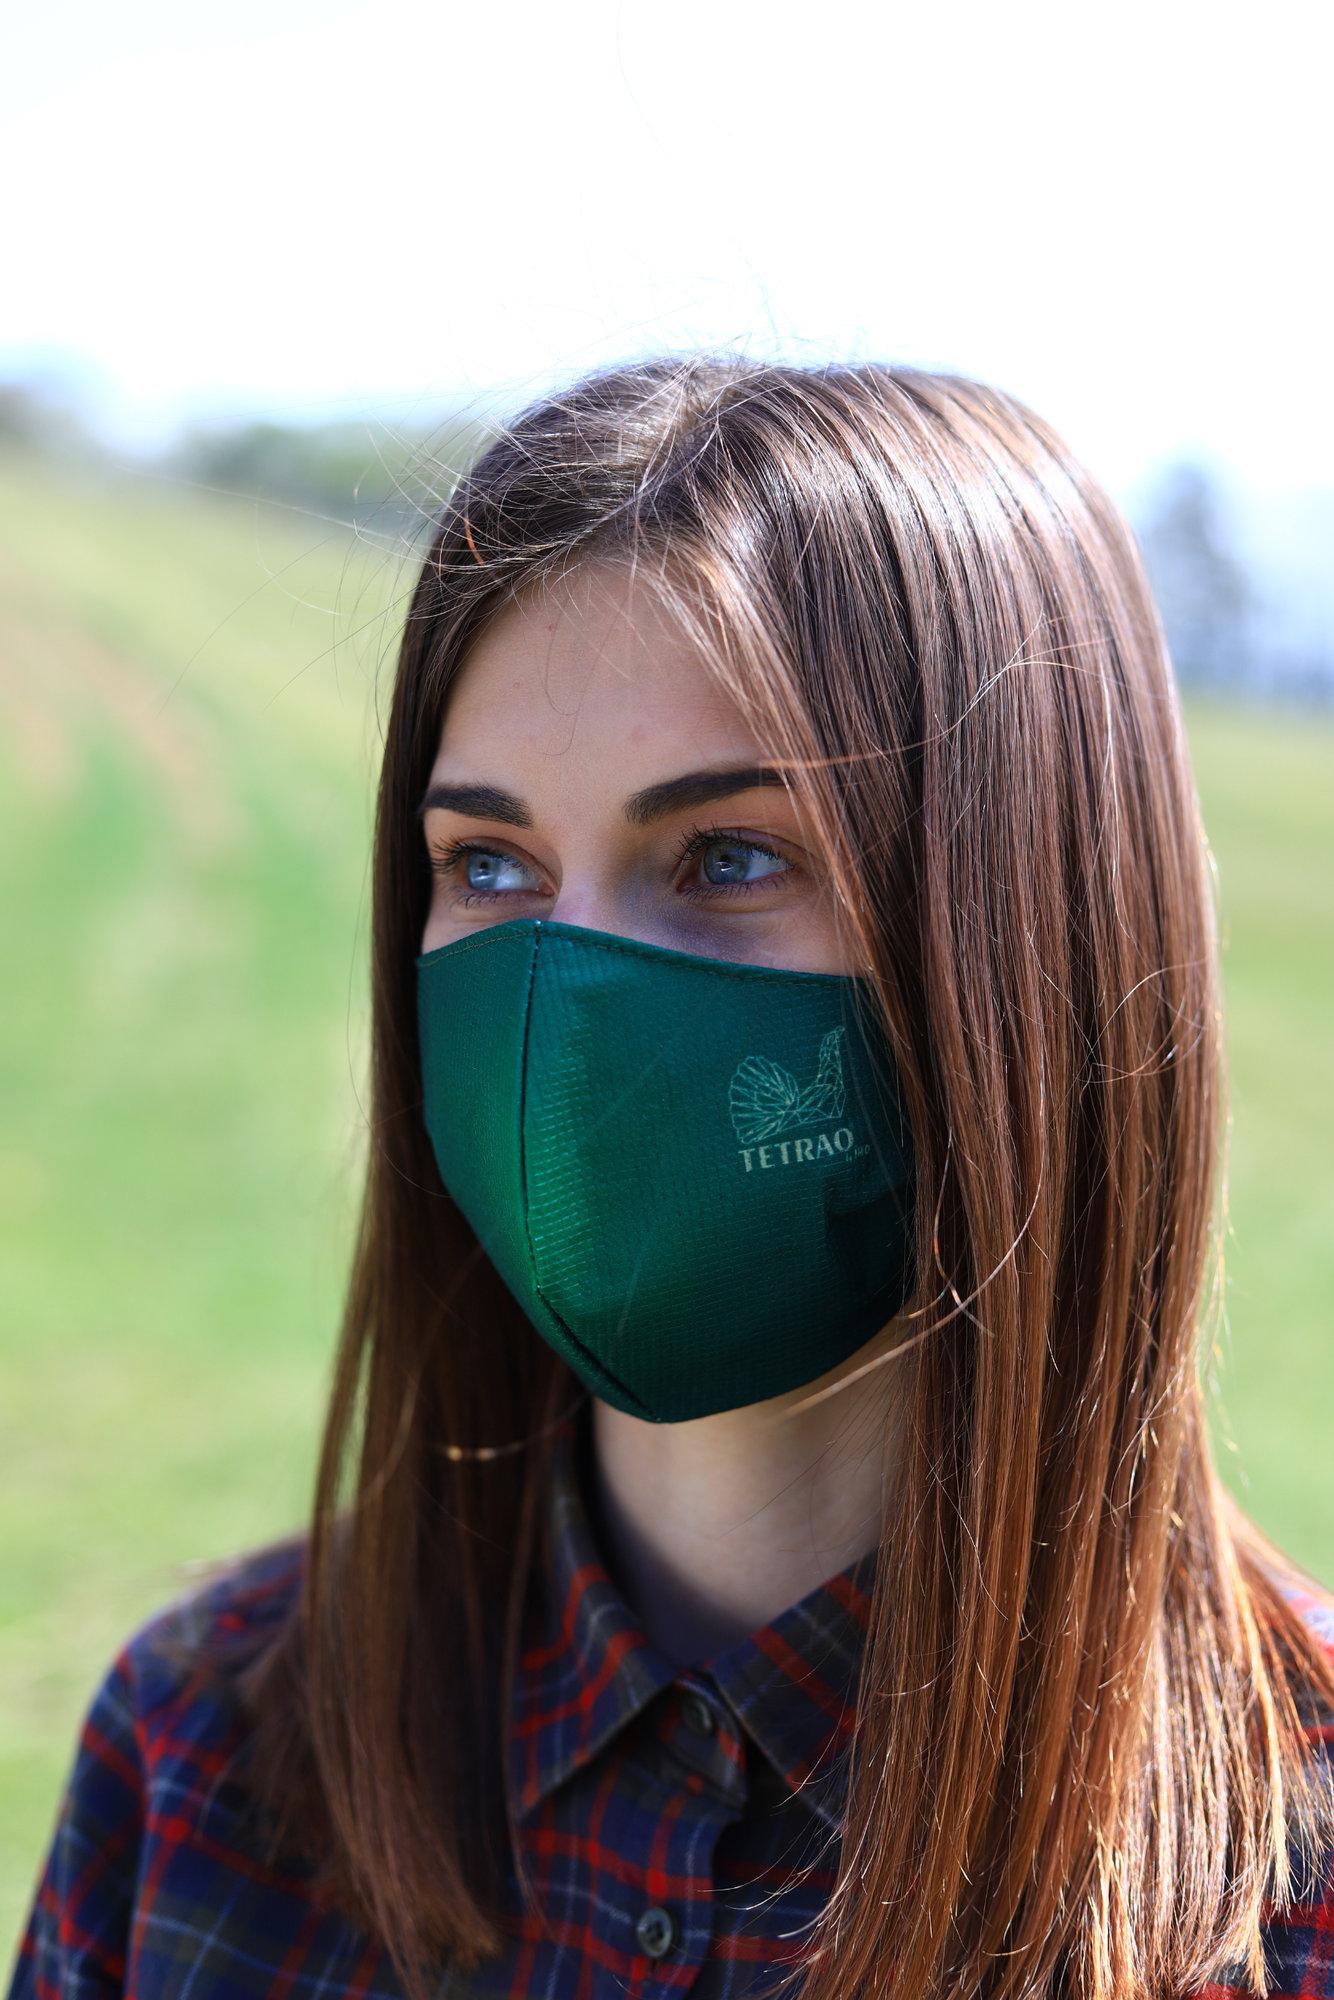 TETRAO bavlnená ochranná maska na tvár - zelené